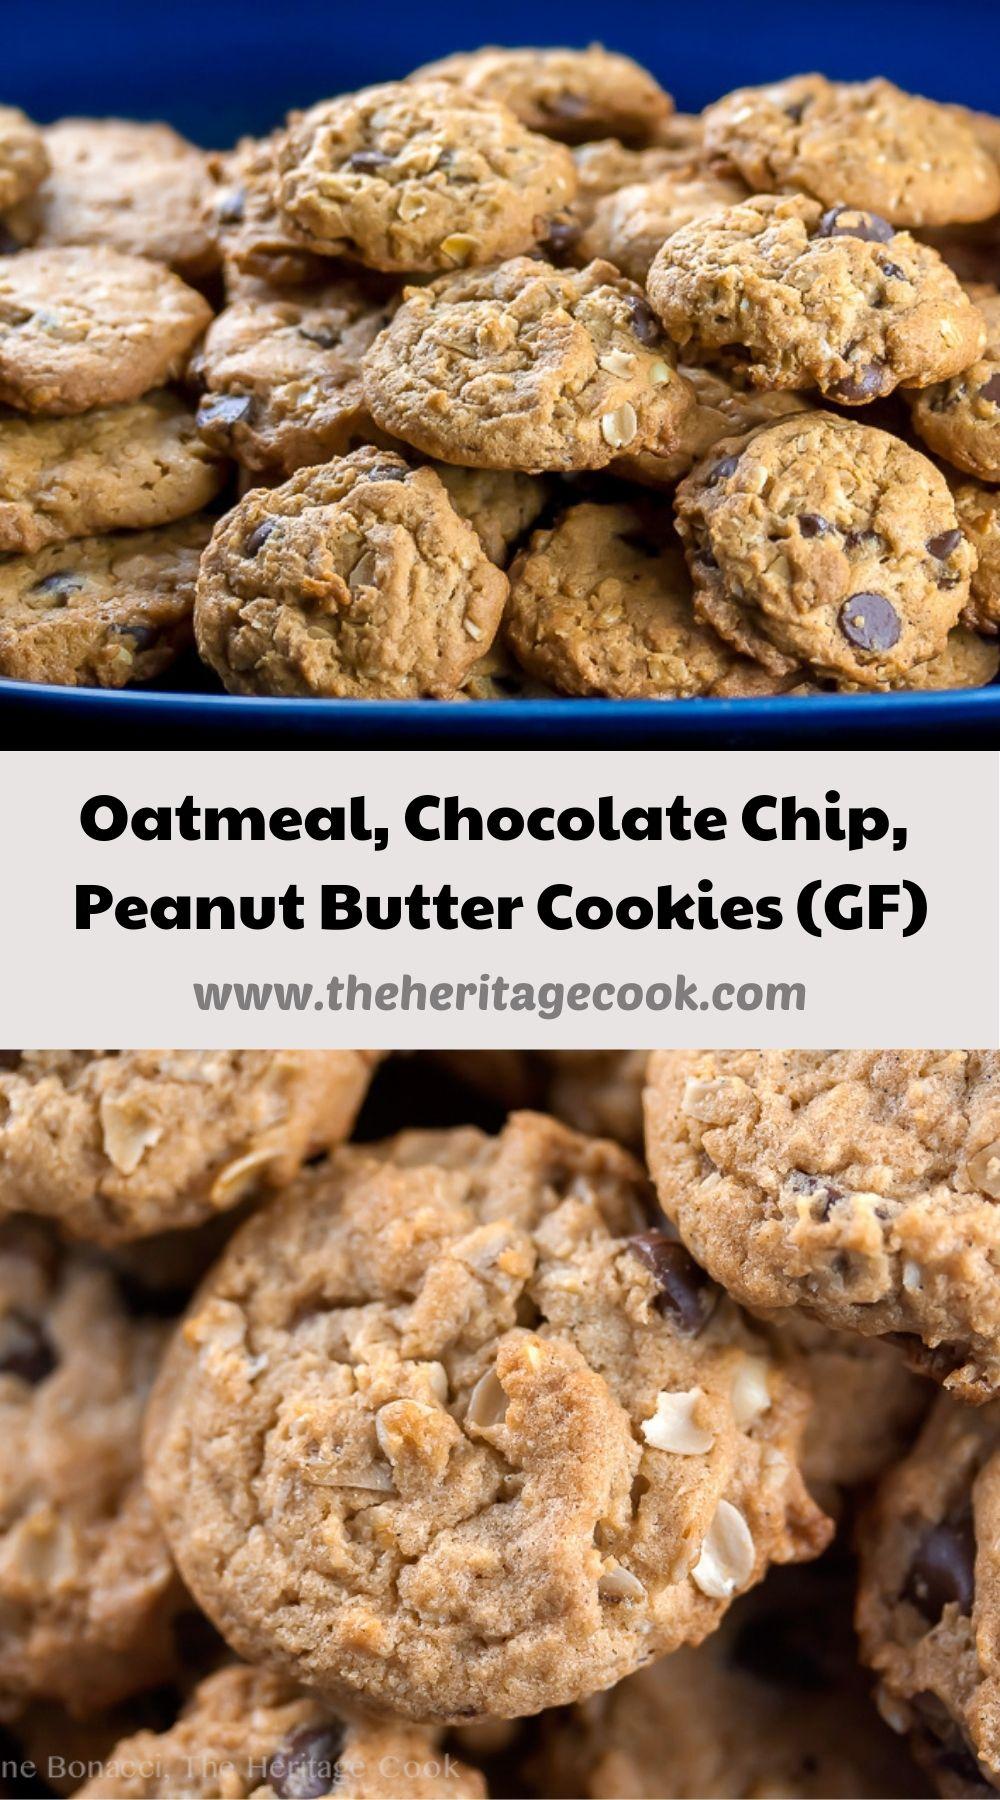 Oatmeal, Chocolate Chip, Peanut Butter Cookies (GF); © 2021 Jane Bonacci, The Heritage Cook